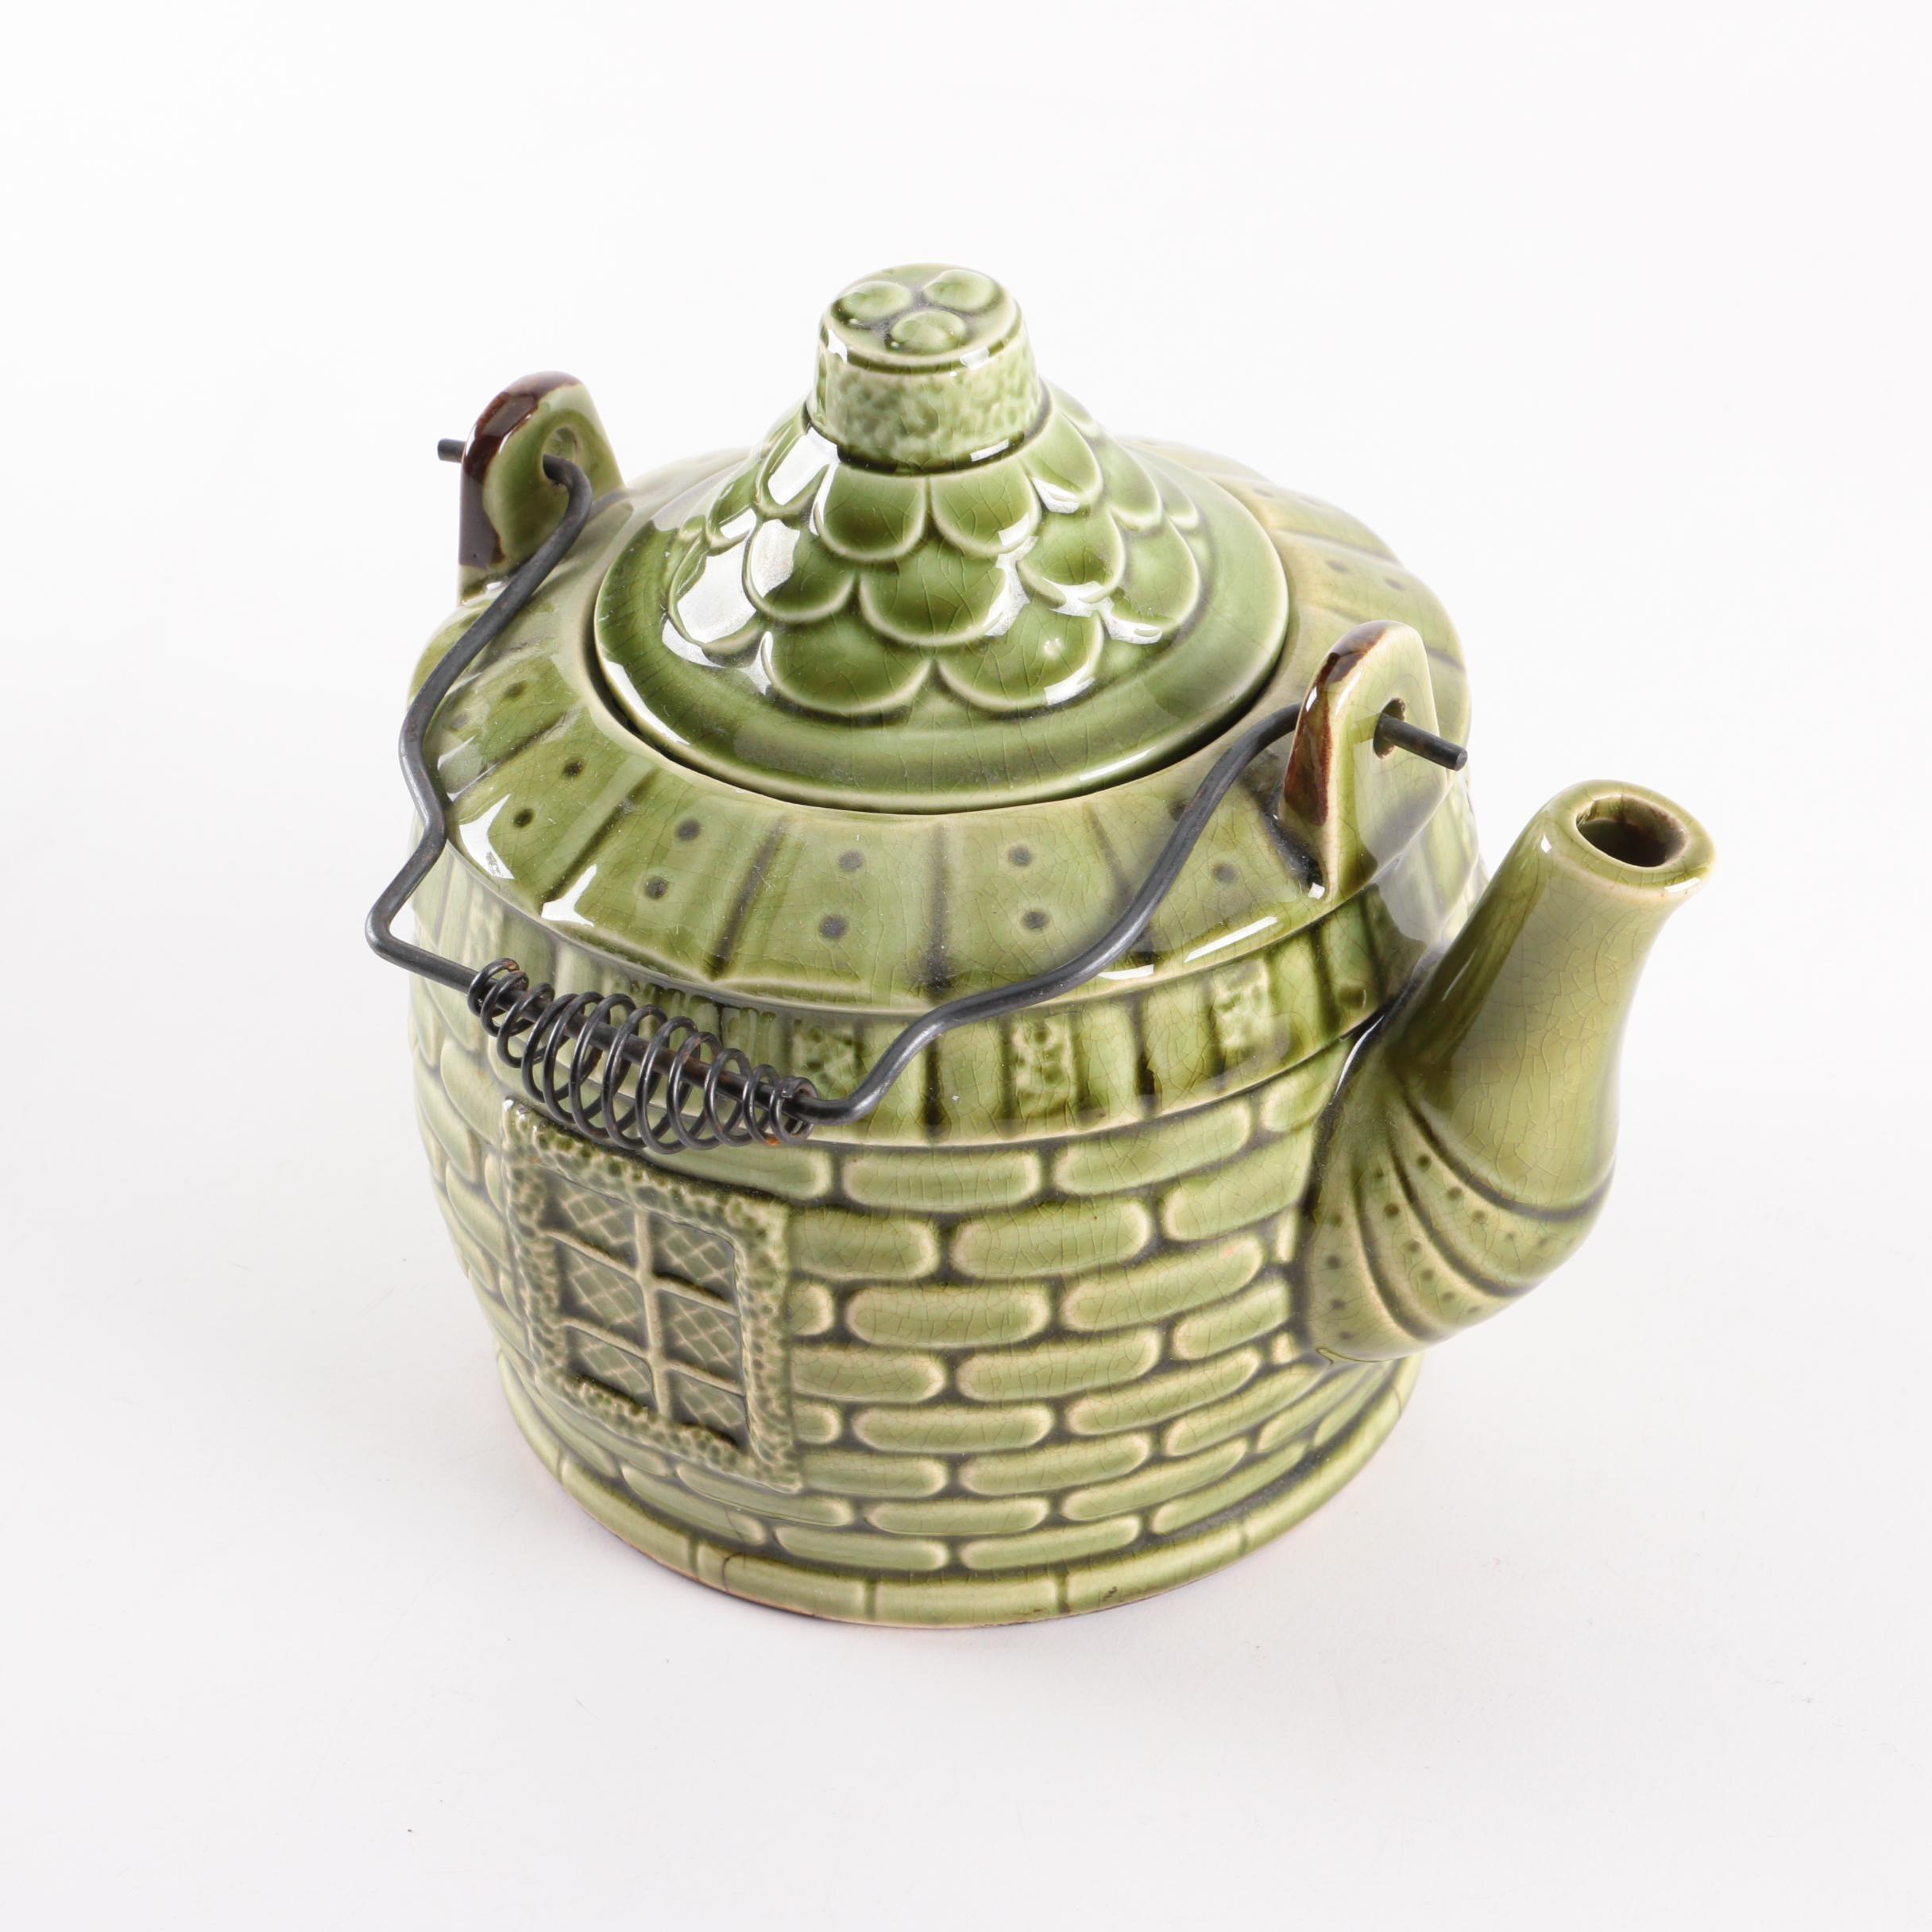 Cottage Motif Stoneware Teapot